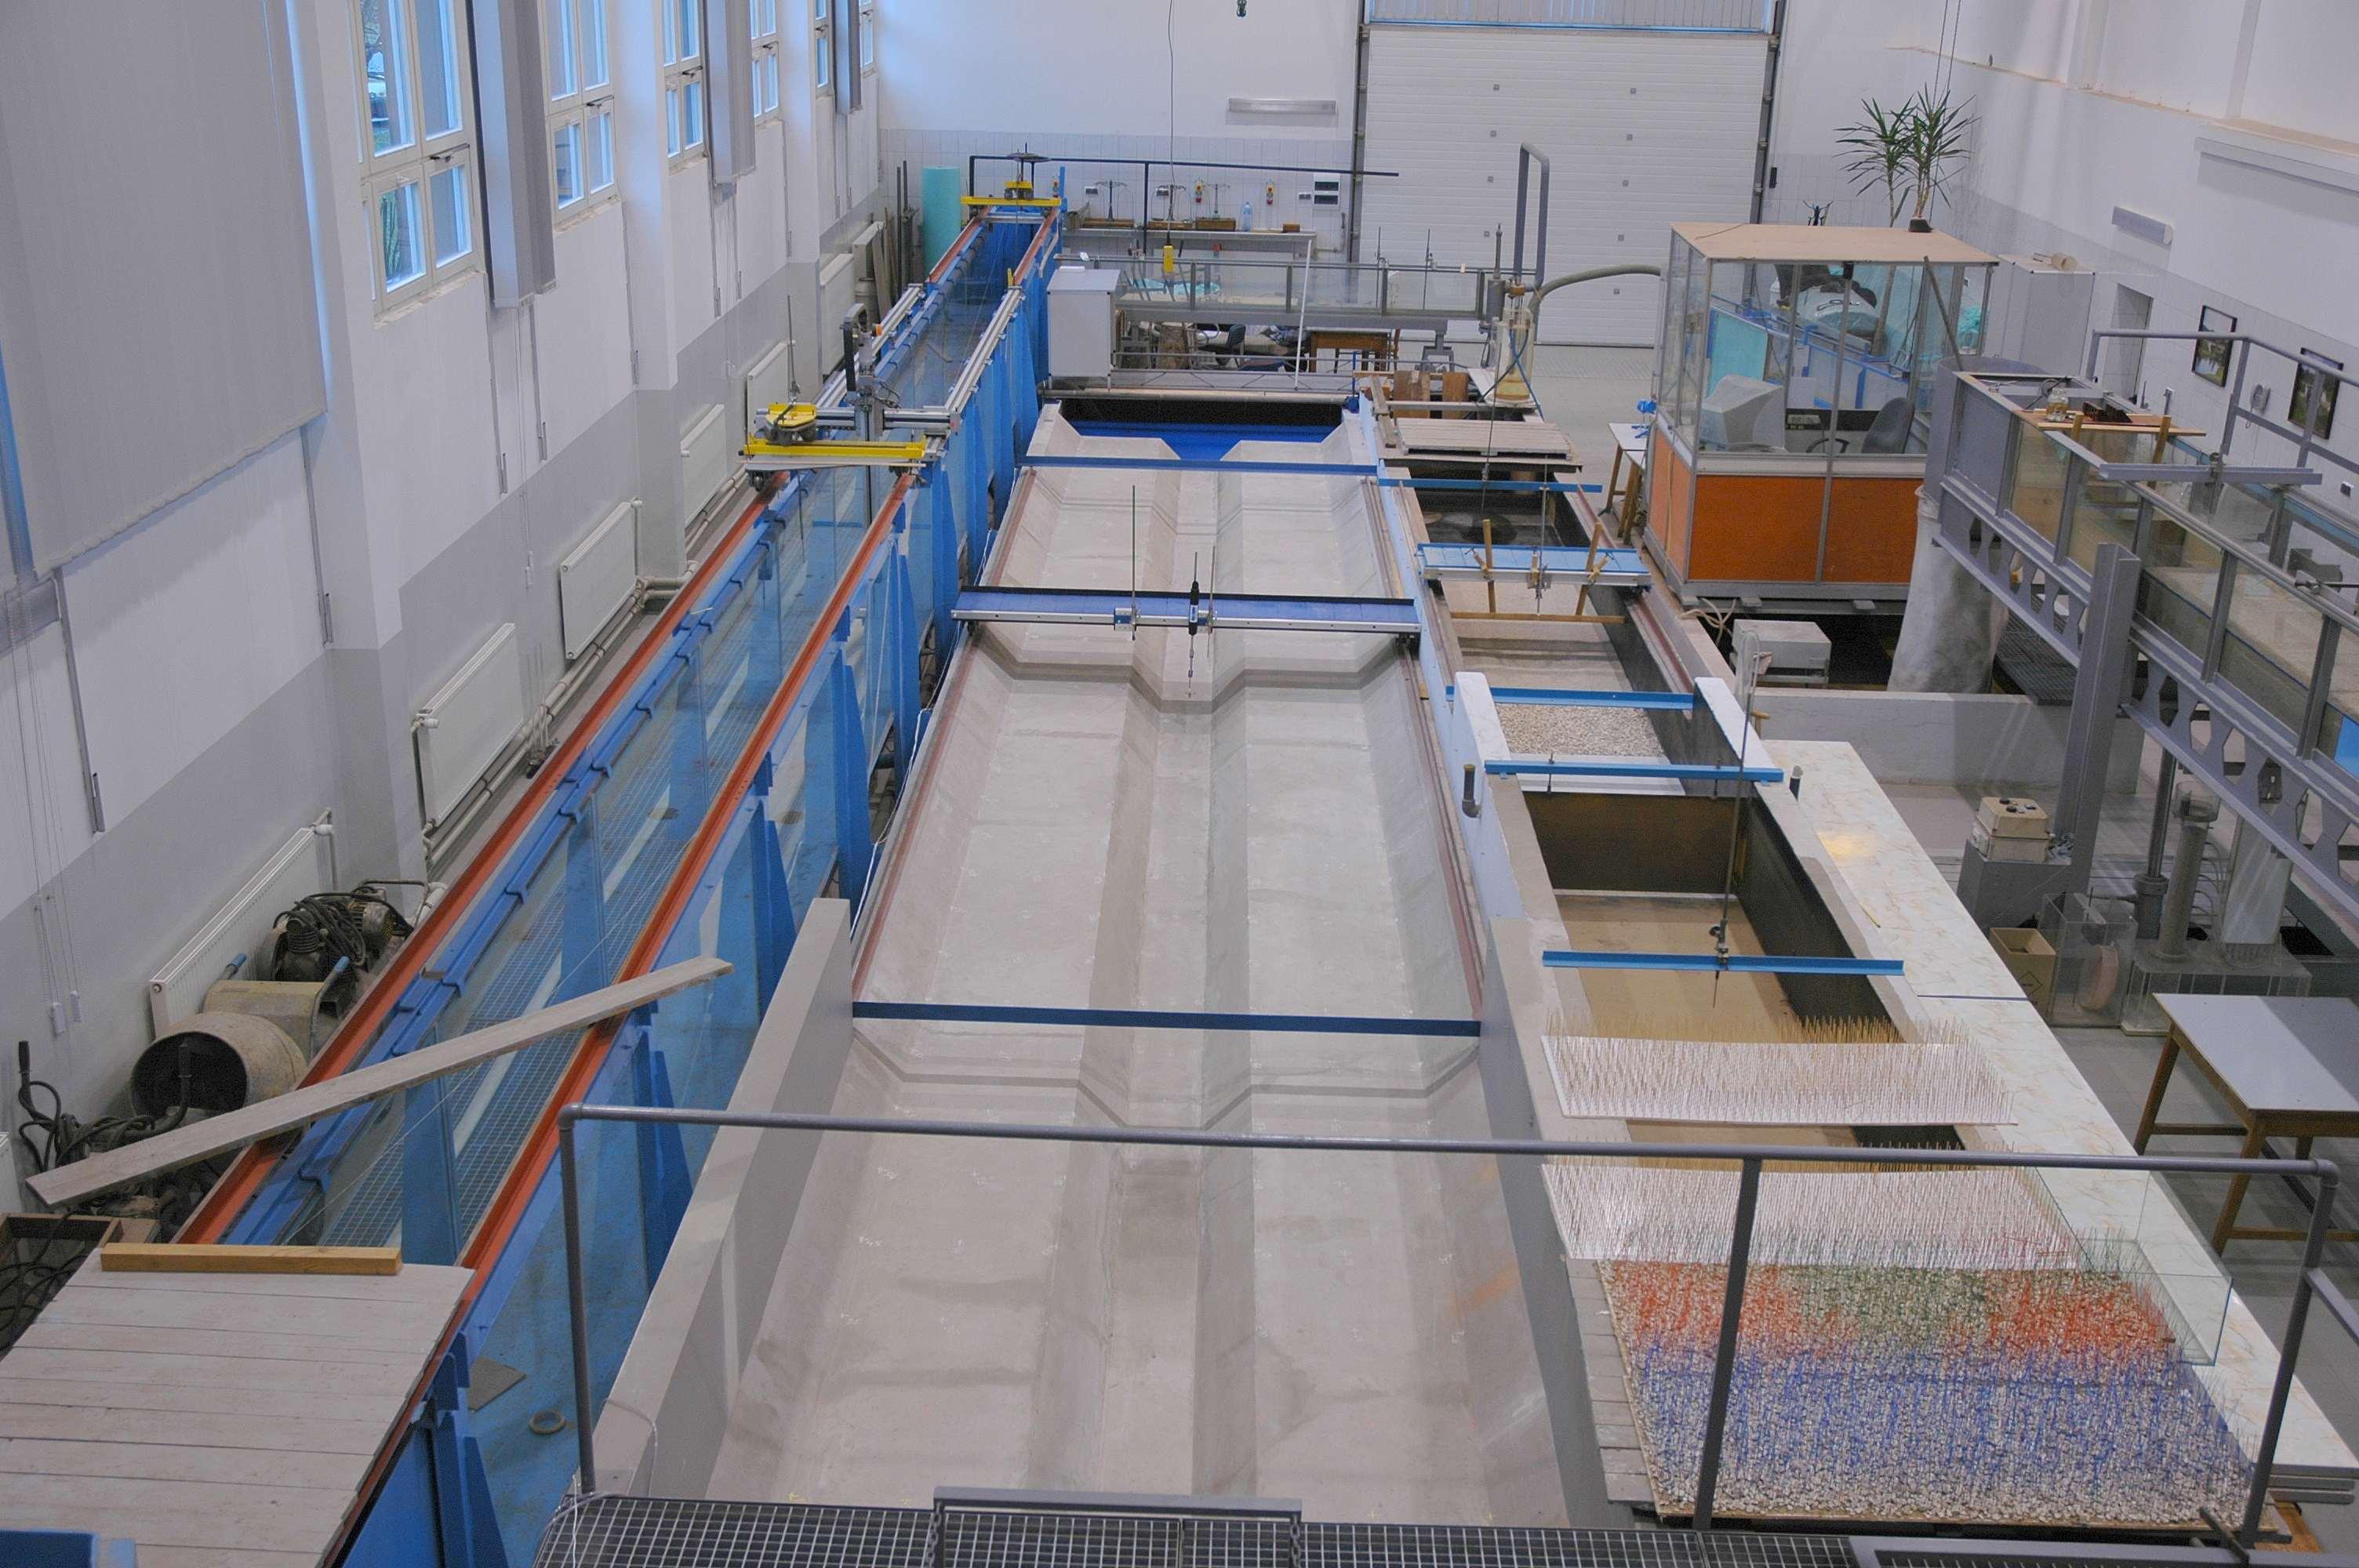 Laboratorium hydrauliczne SGGW